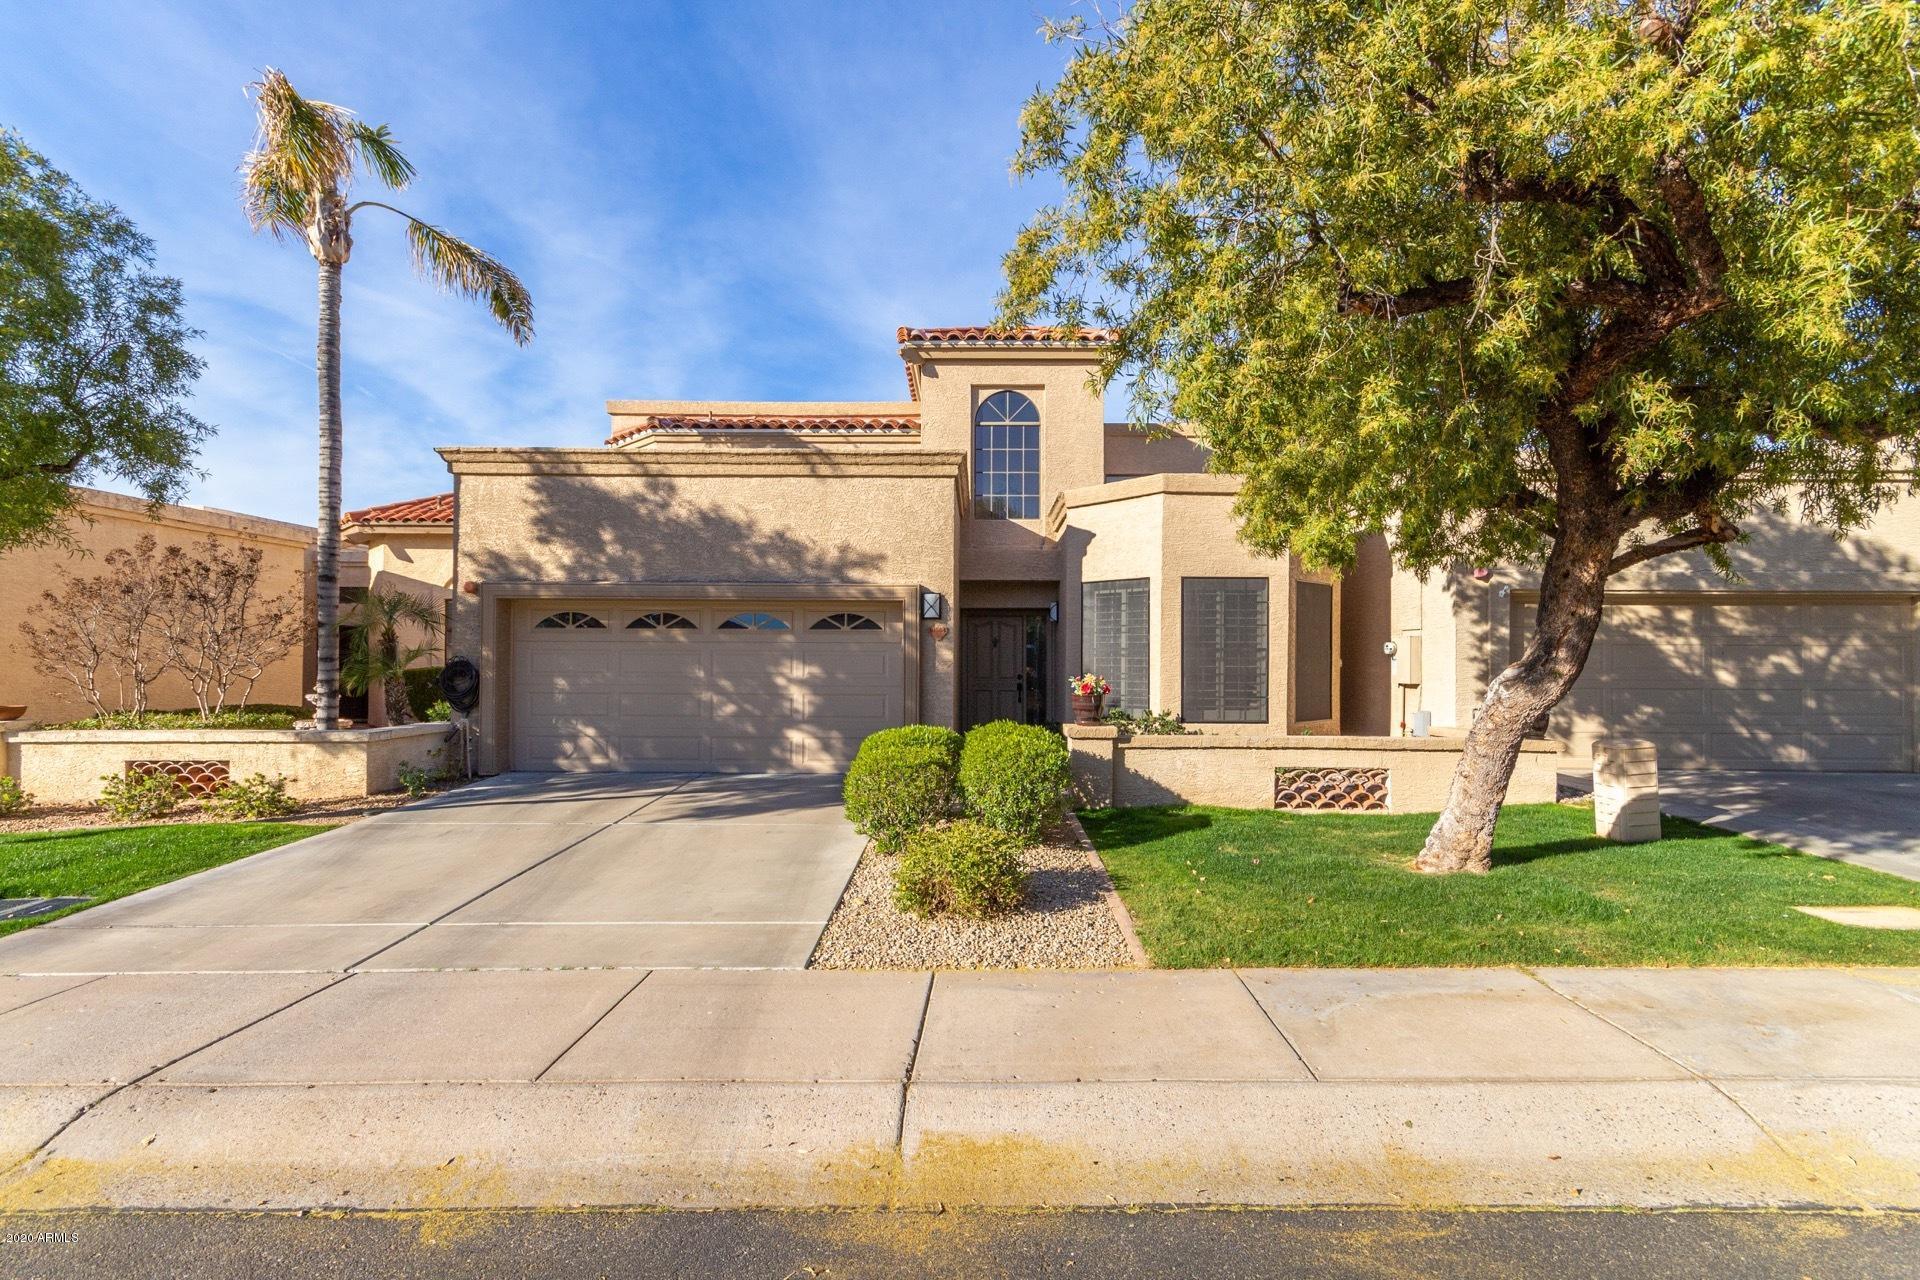 Photo of 10564 E SADDLEHORN Drive, Scottsdale, AZ 85258